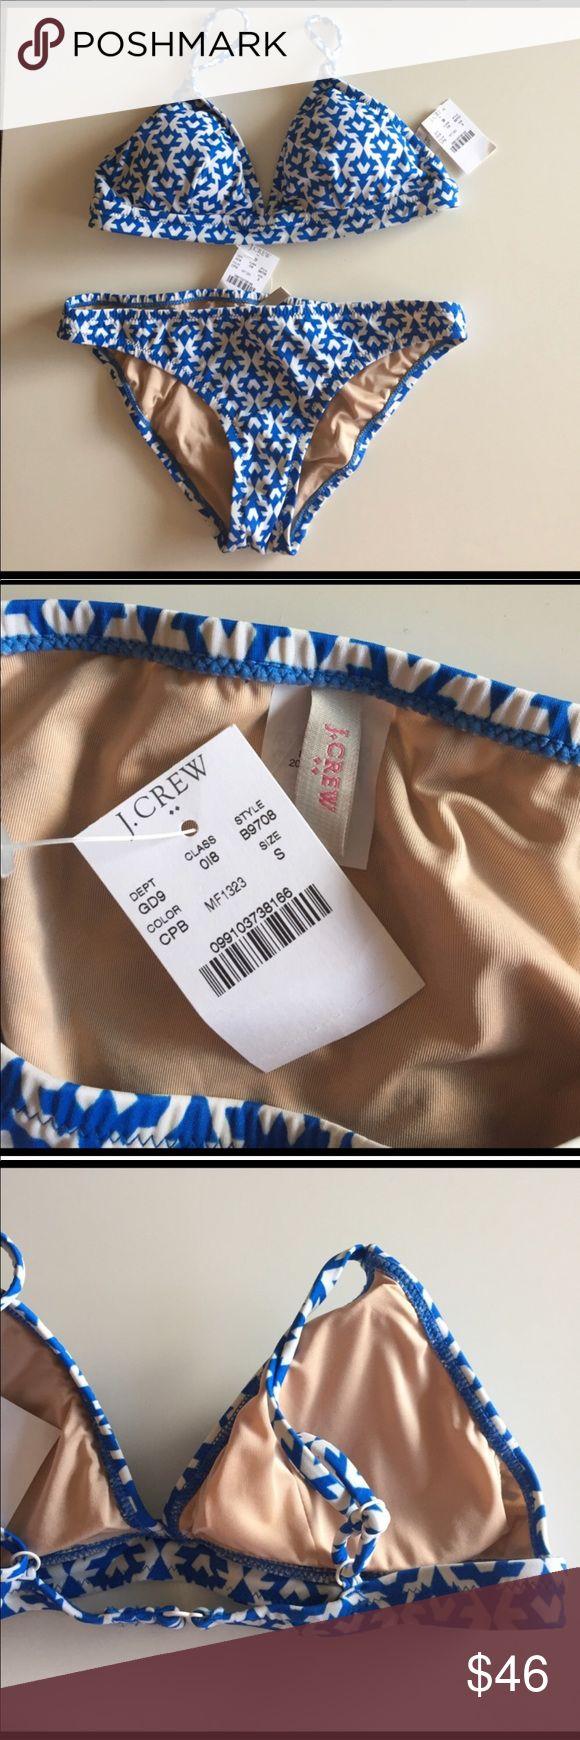 J. Crew blue white bikini NWT small J. Crew bikini swim suit. Blue and white. Removable pads. New with tags! J. Crew Swim Bikinis